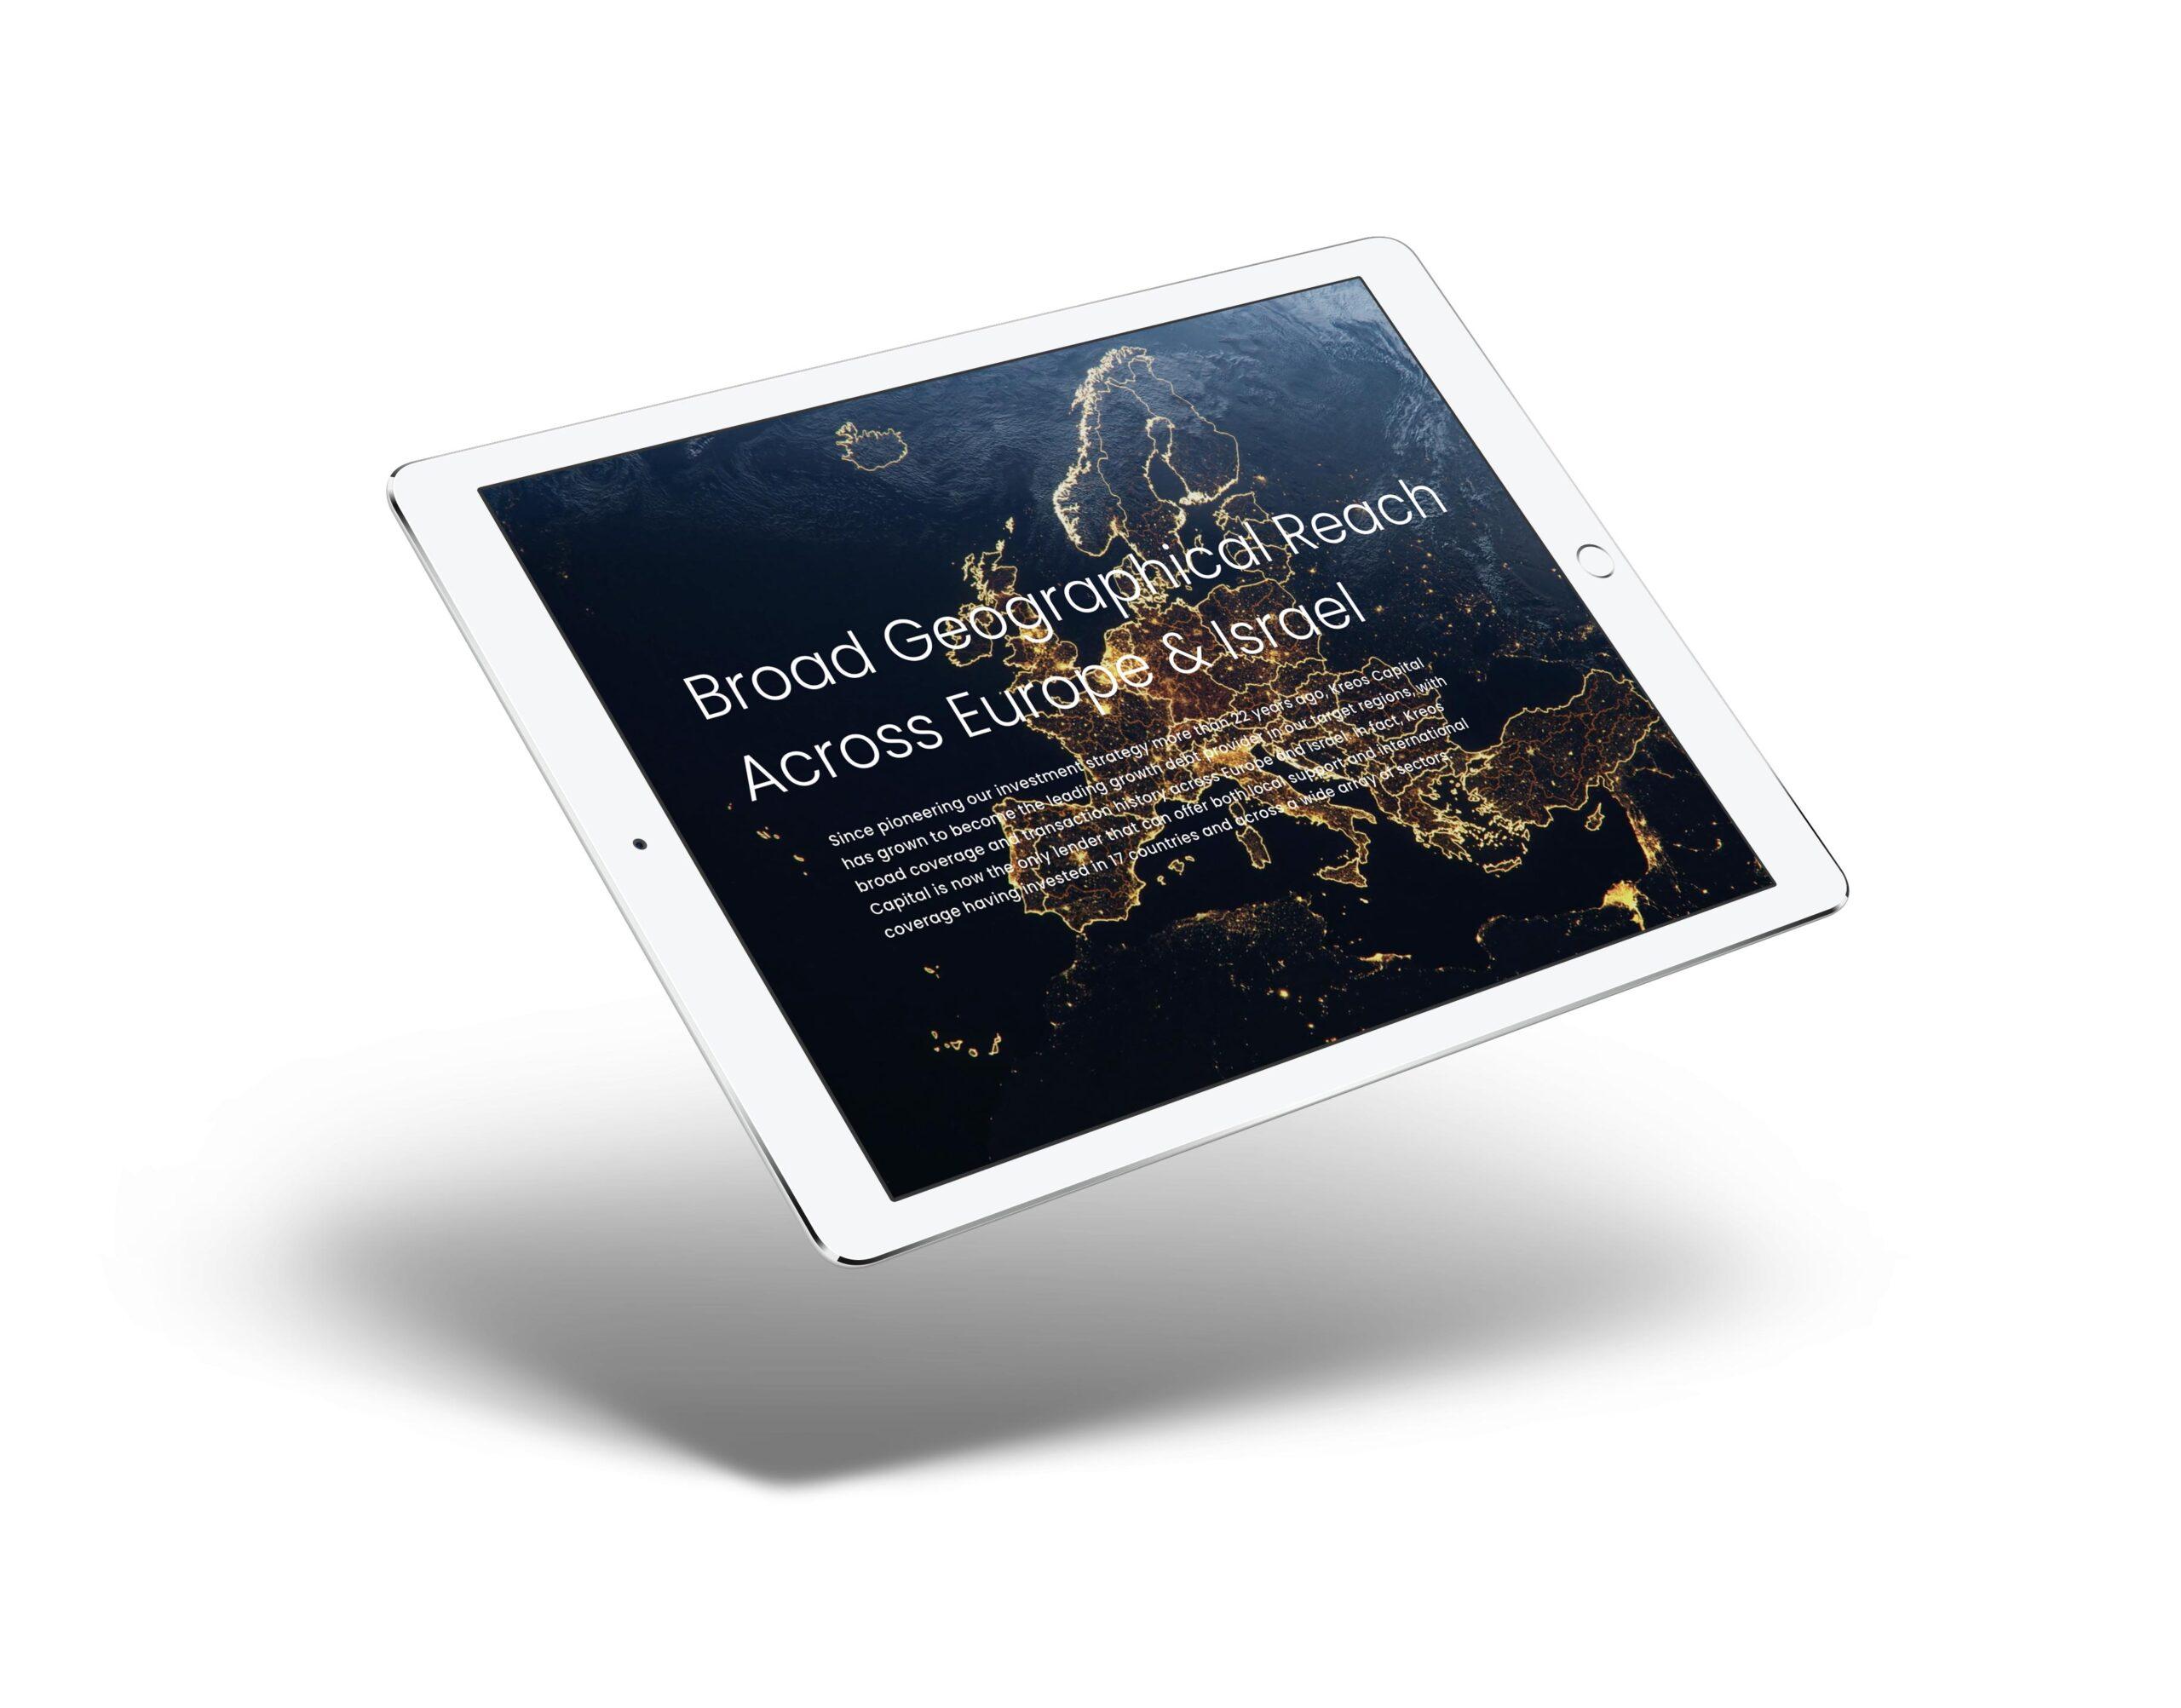 Kreos Finance web design